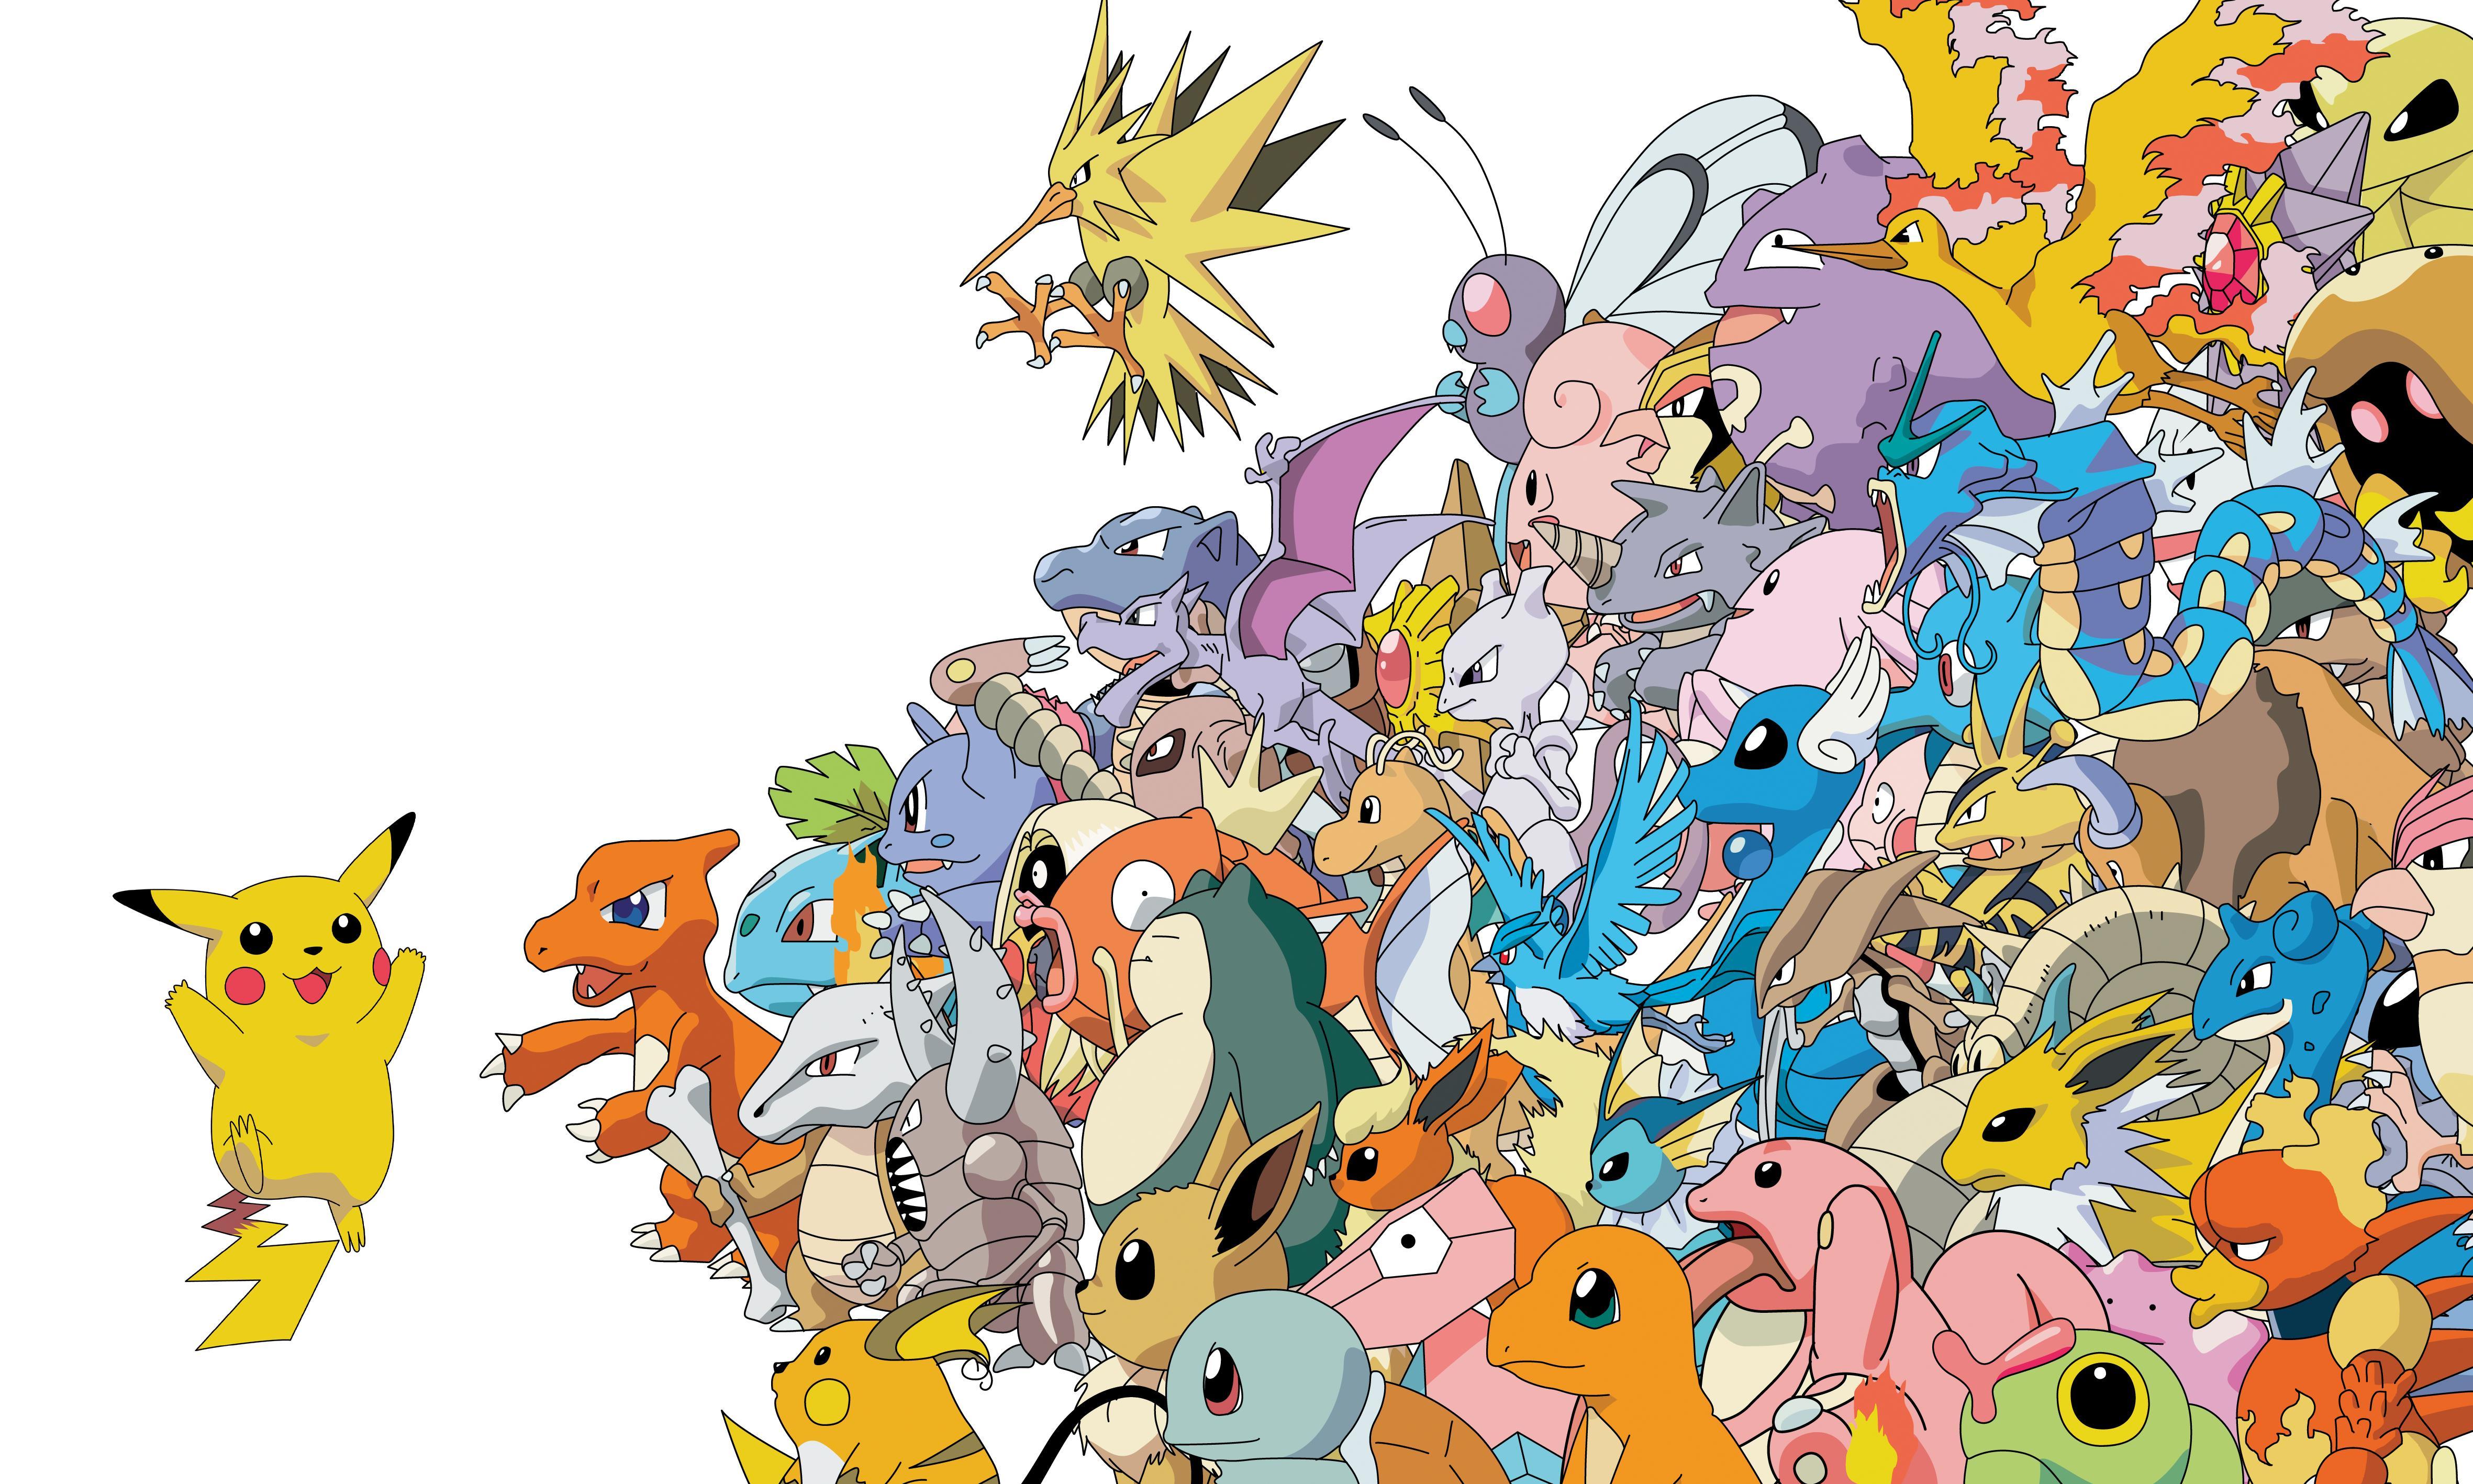 http://collider.com/wp-content/uploads/pokemon-pikachu.jpg